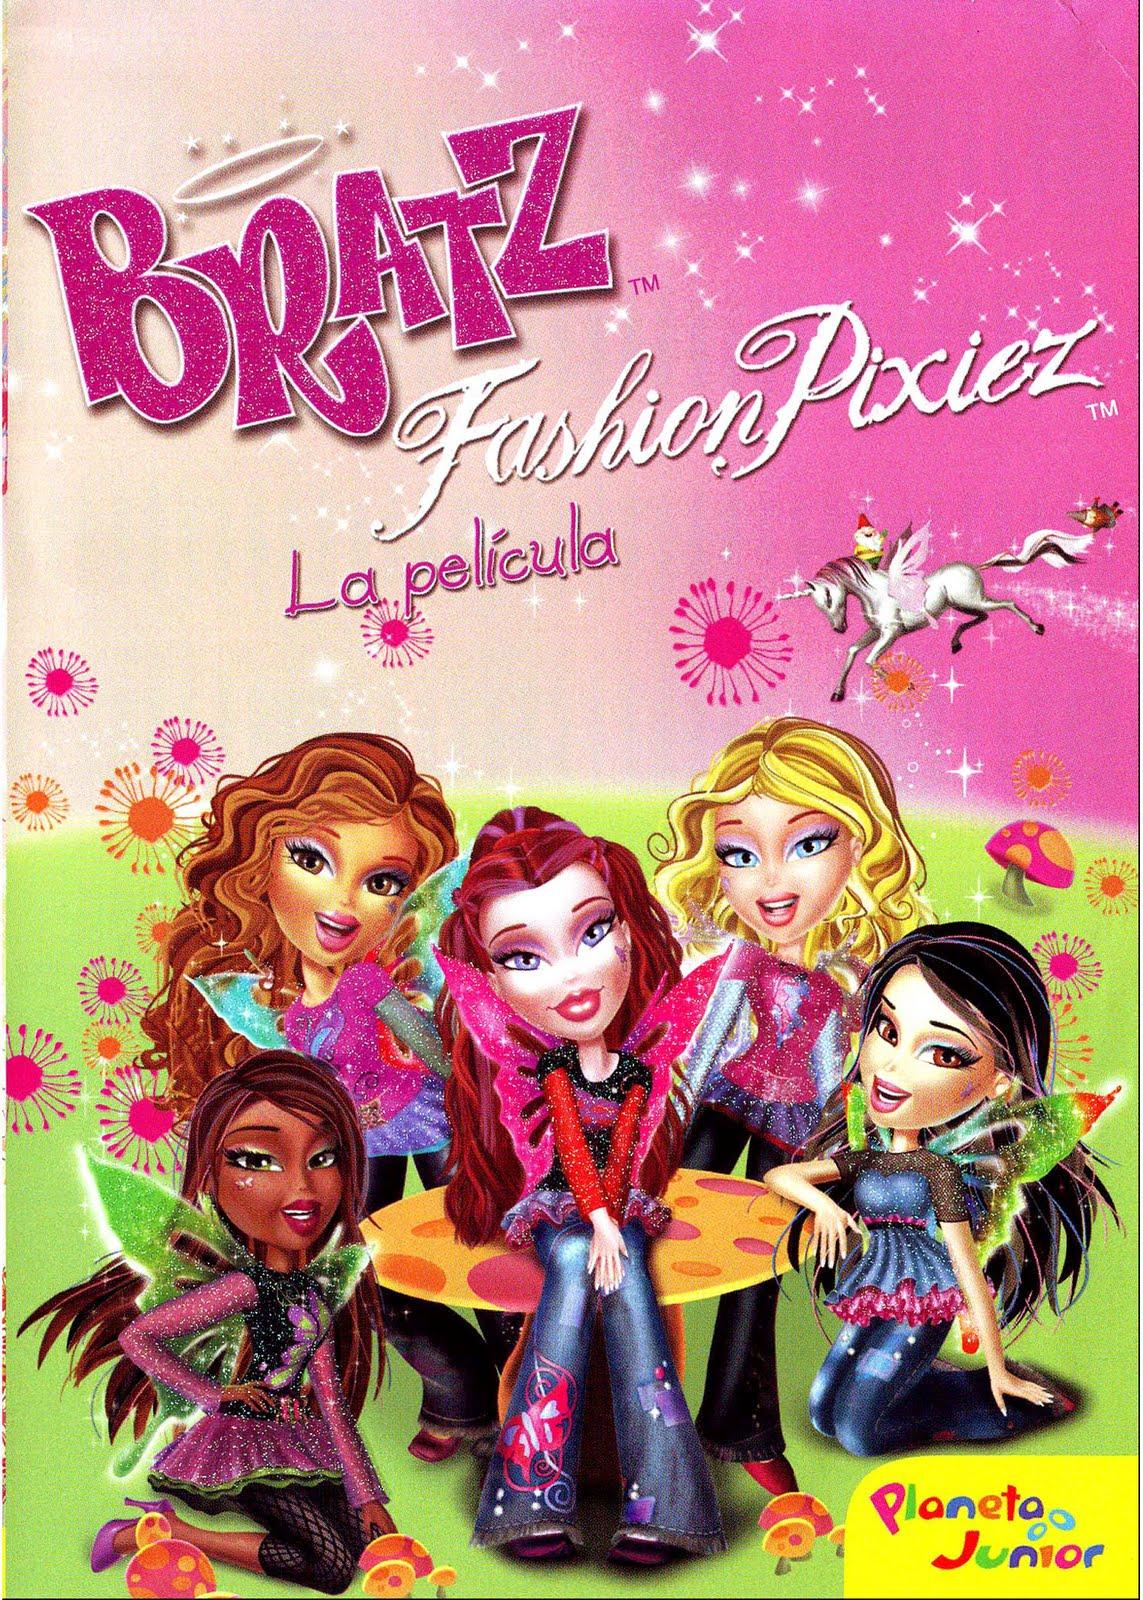 Bratz fashion pixiez full movie putlocker 90